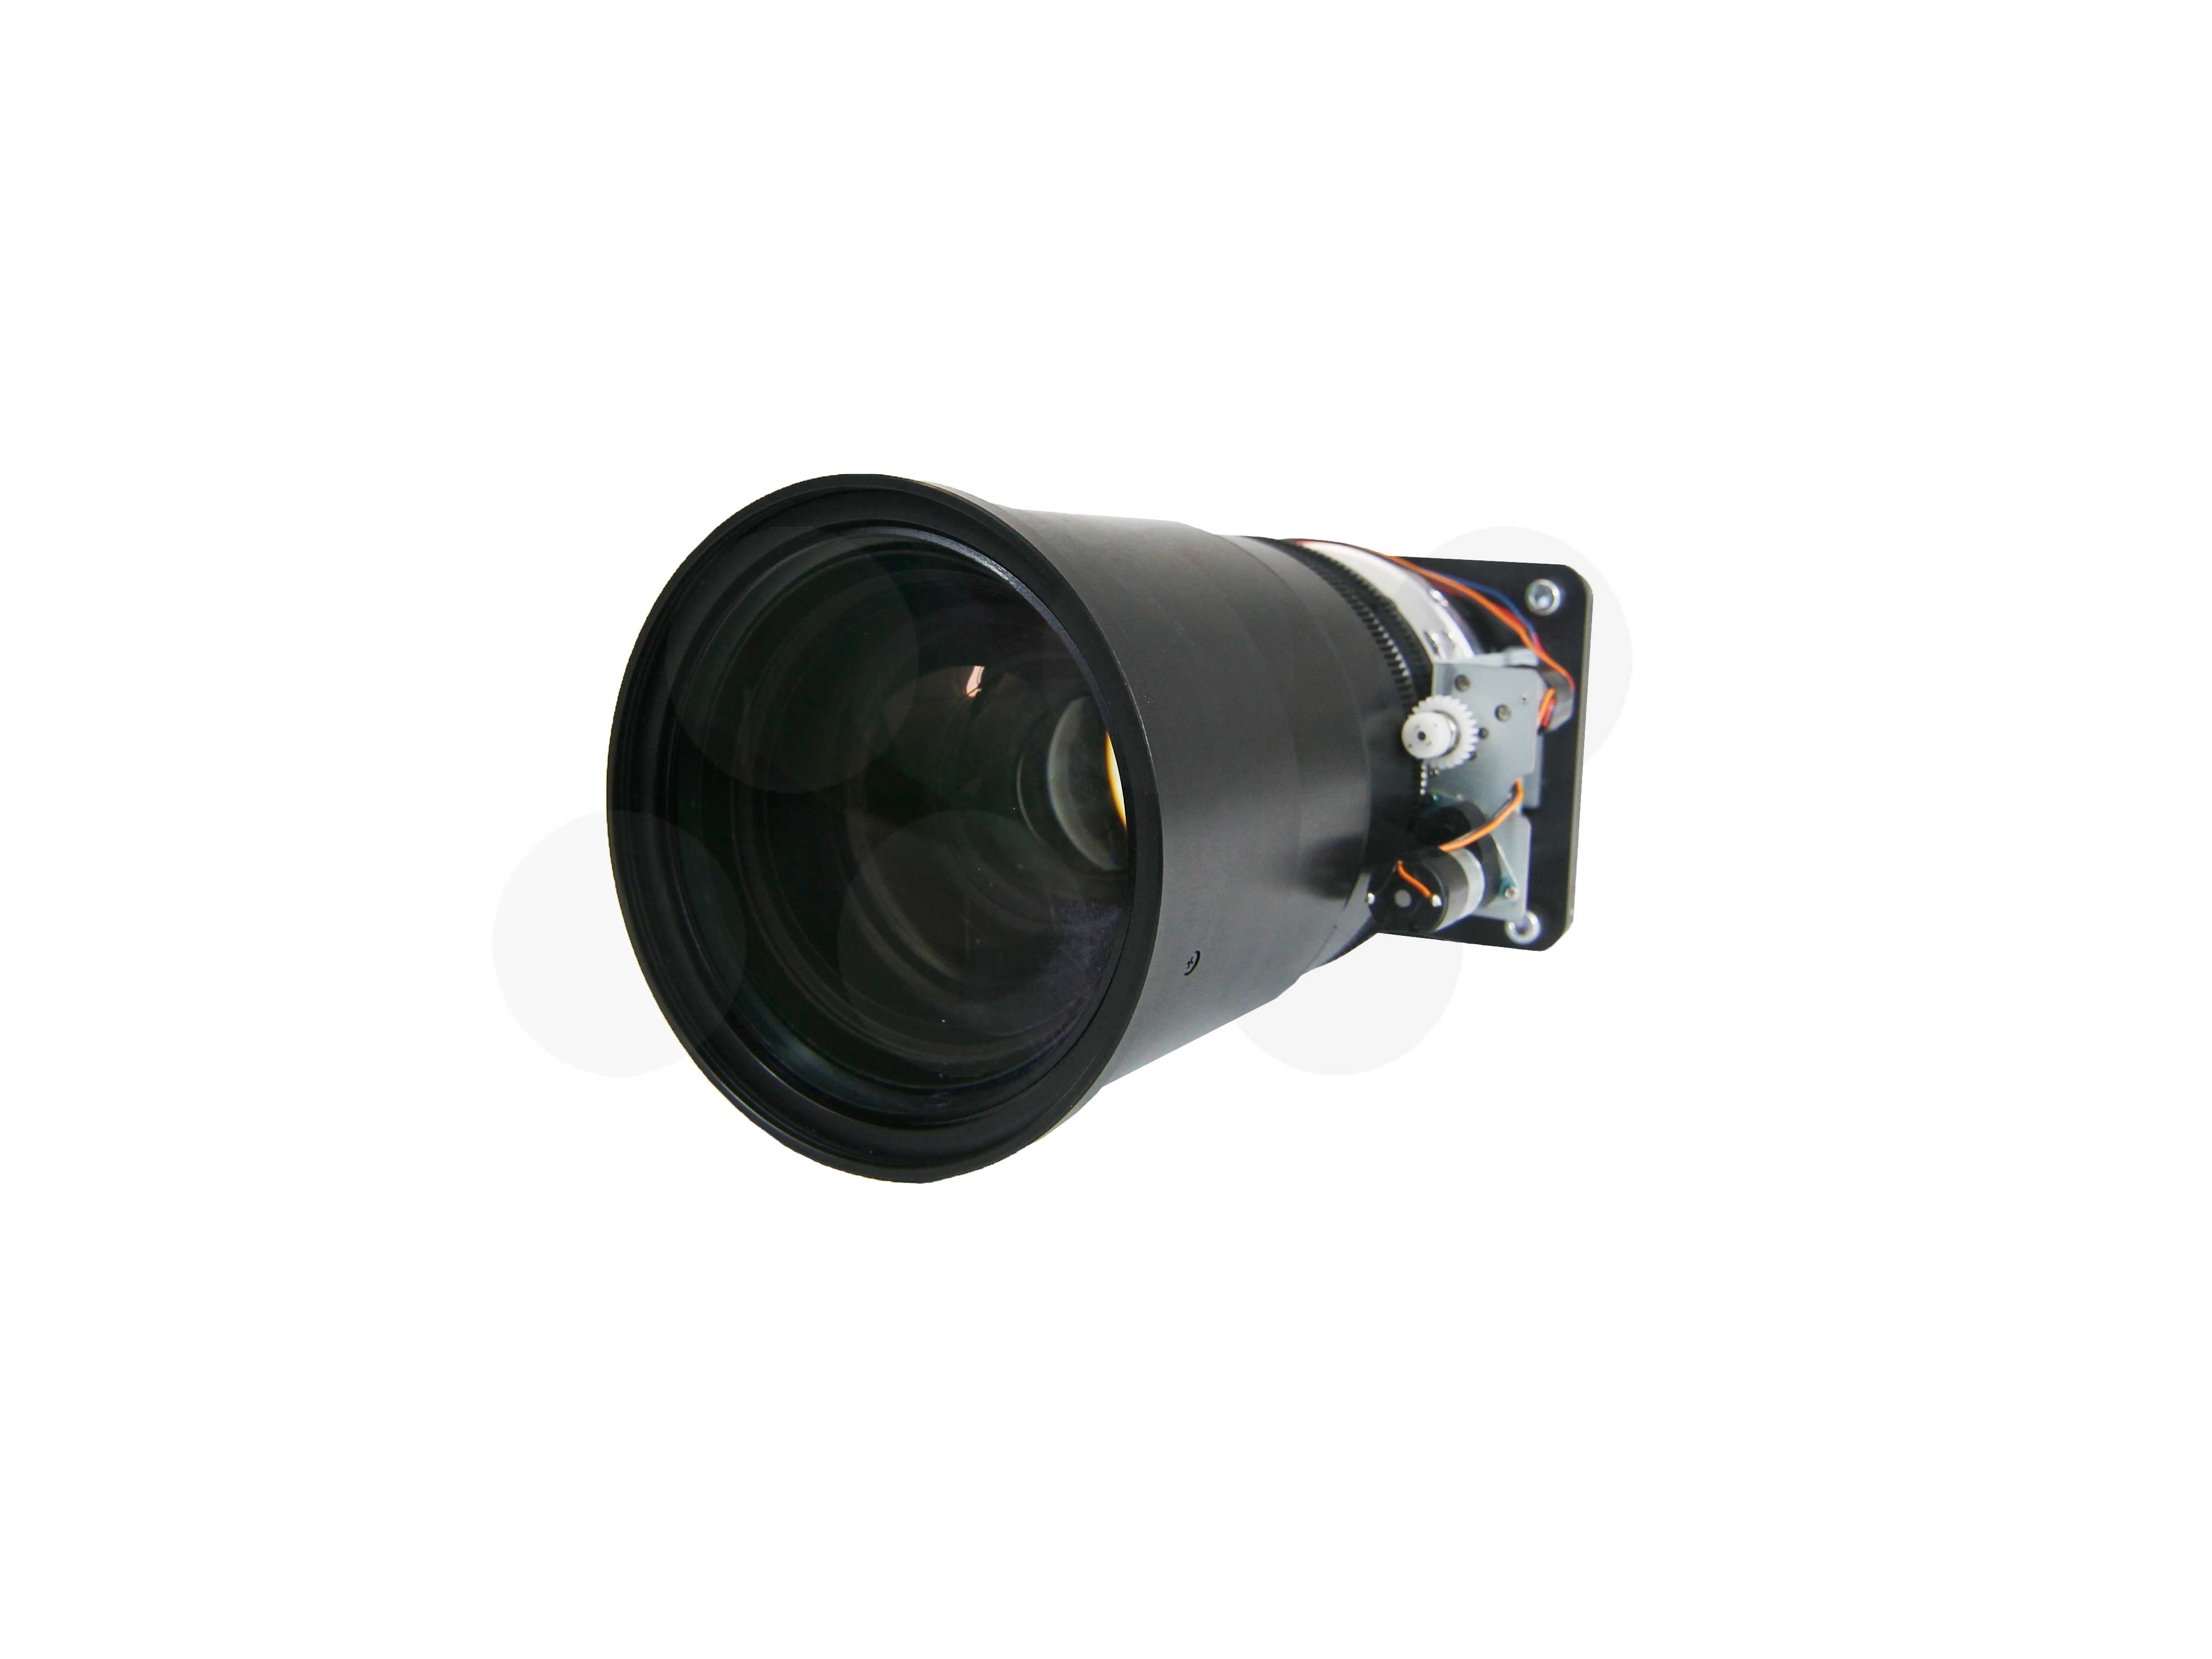 Christie 1.8-2.4:1 Standard Zoom Lens LX/XP/LHD Series